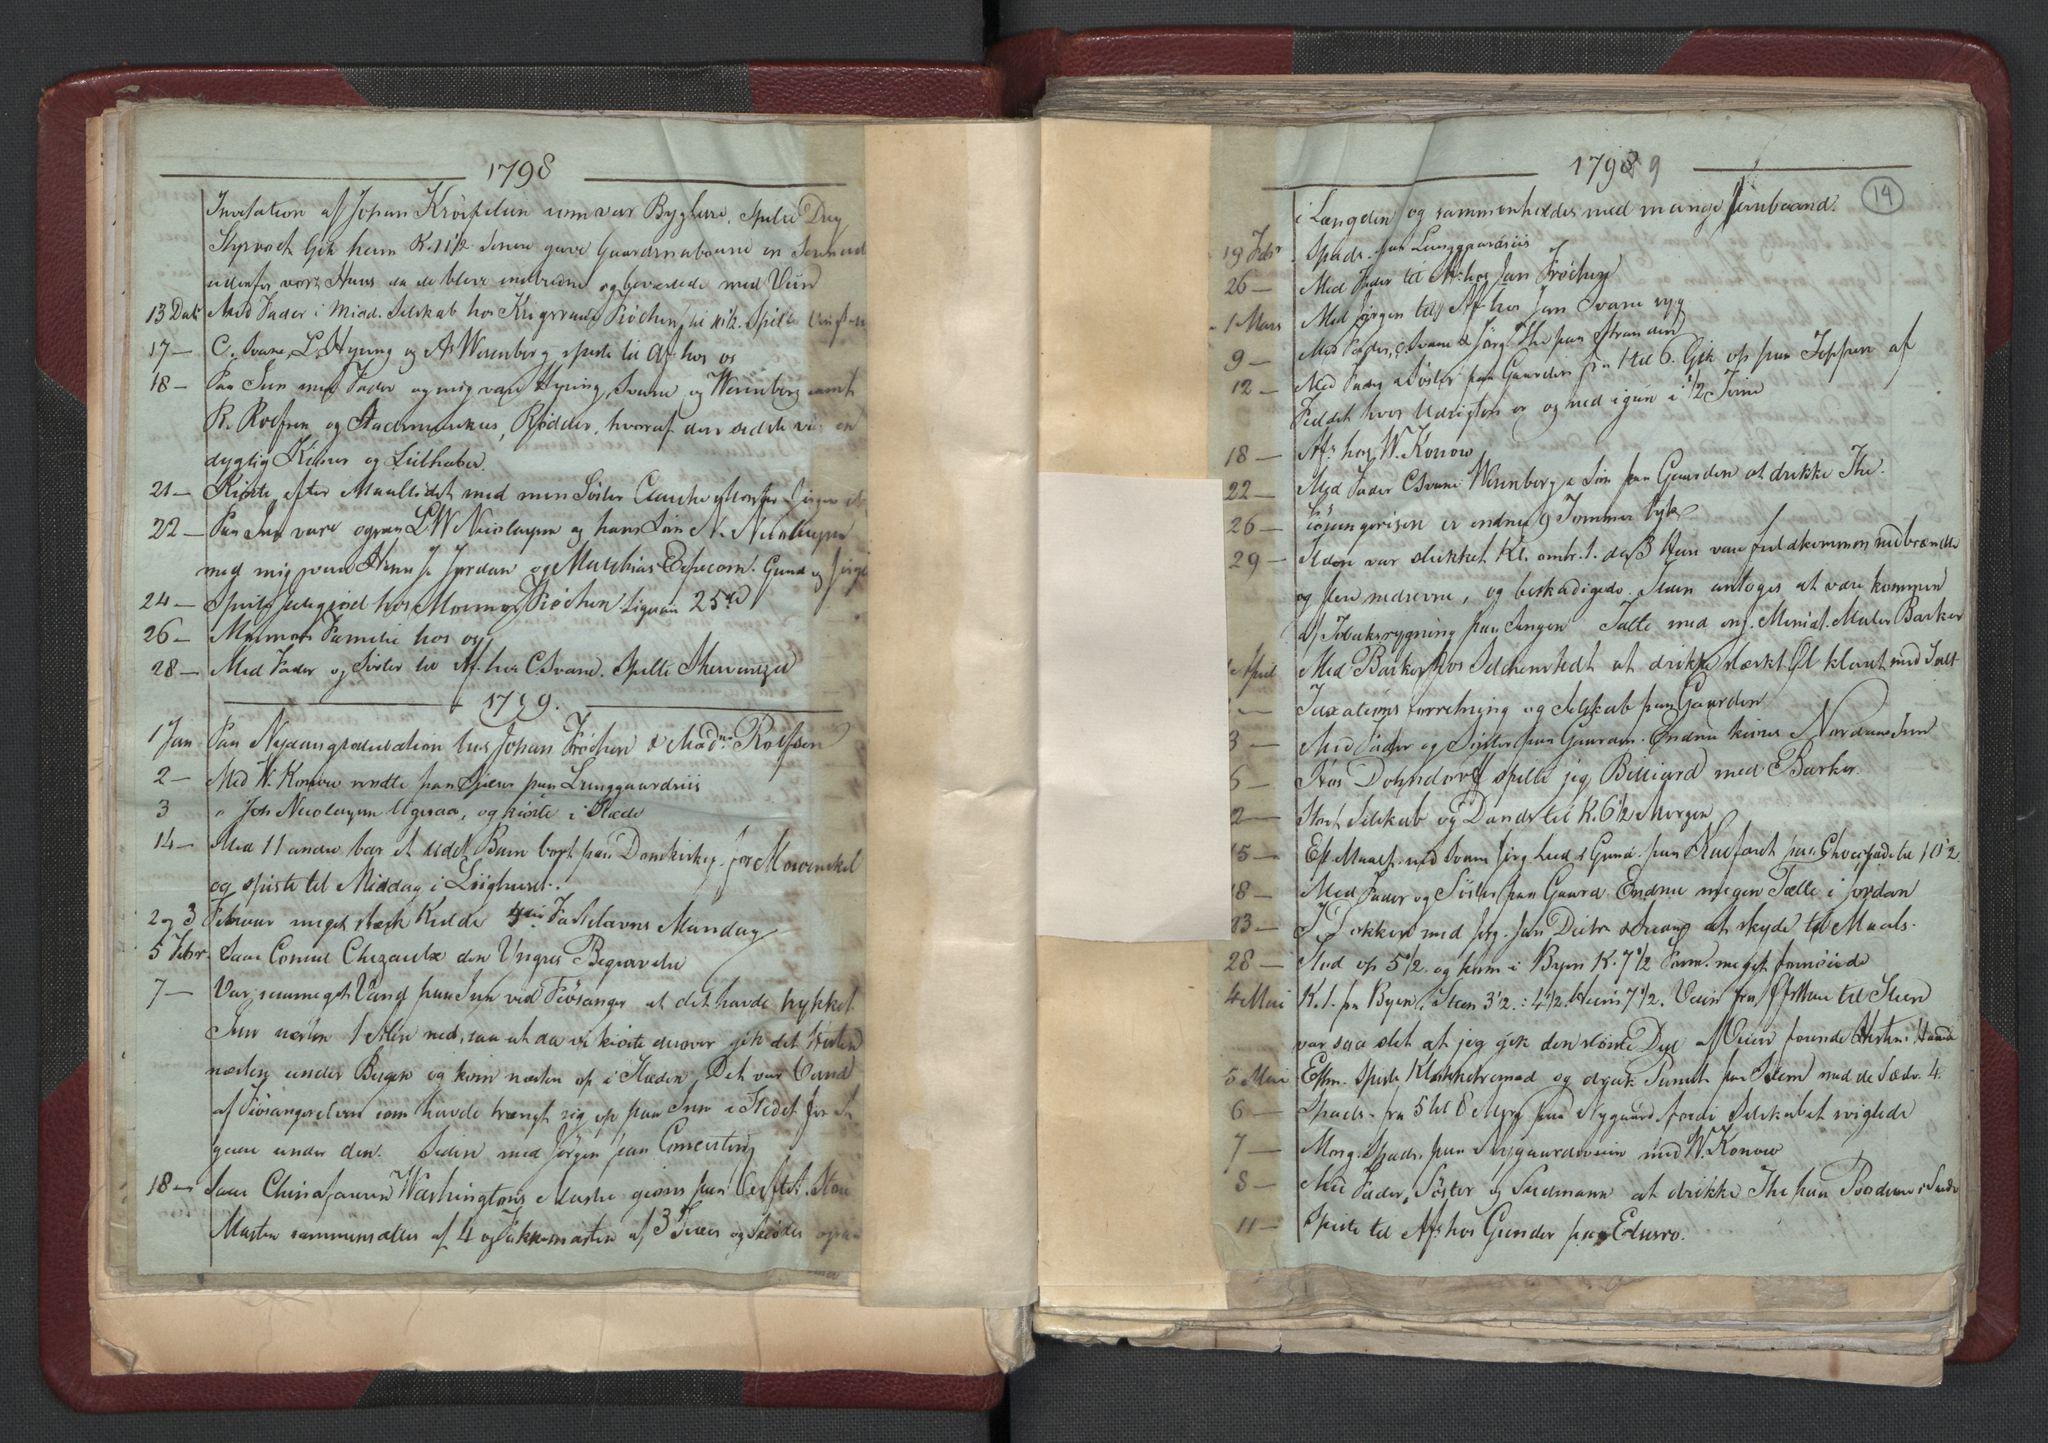 RA, Meltzer, Fredrik, F/L0001: Dagbok for årene 1796-1808, 1811, 1817, 1796-1817, s. 13b-14a